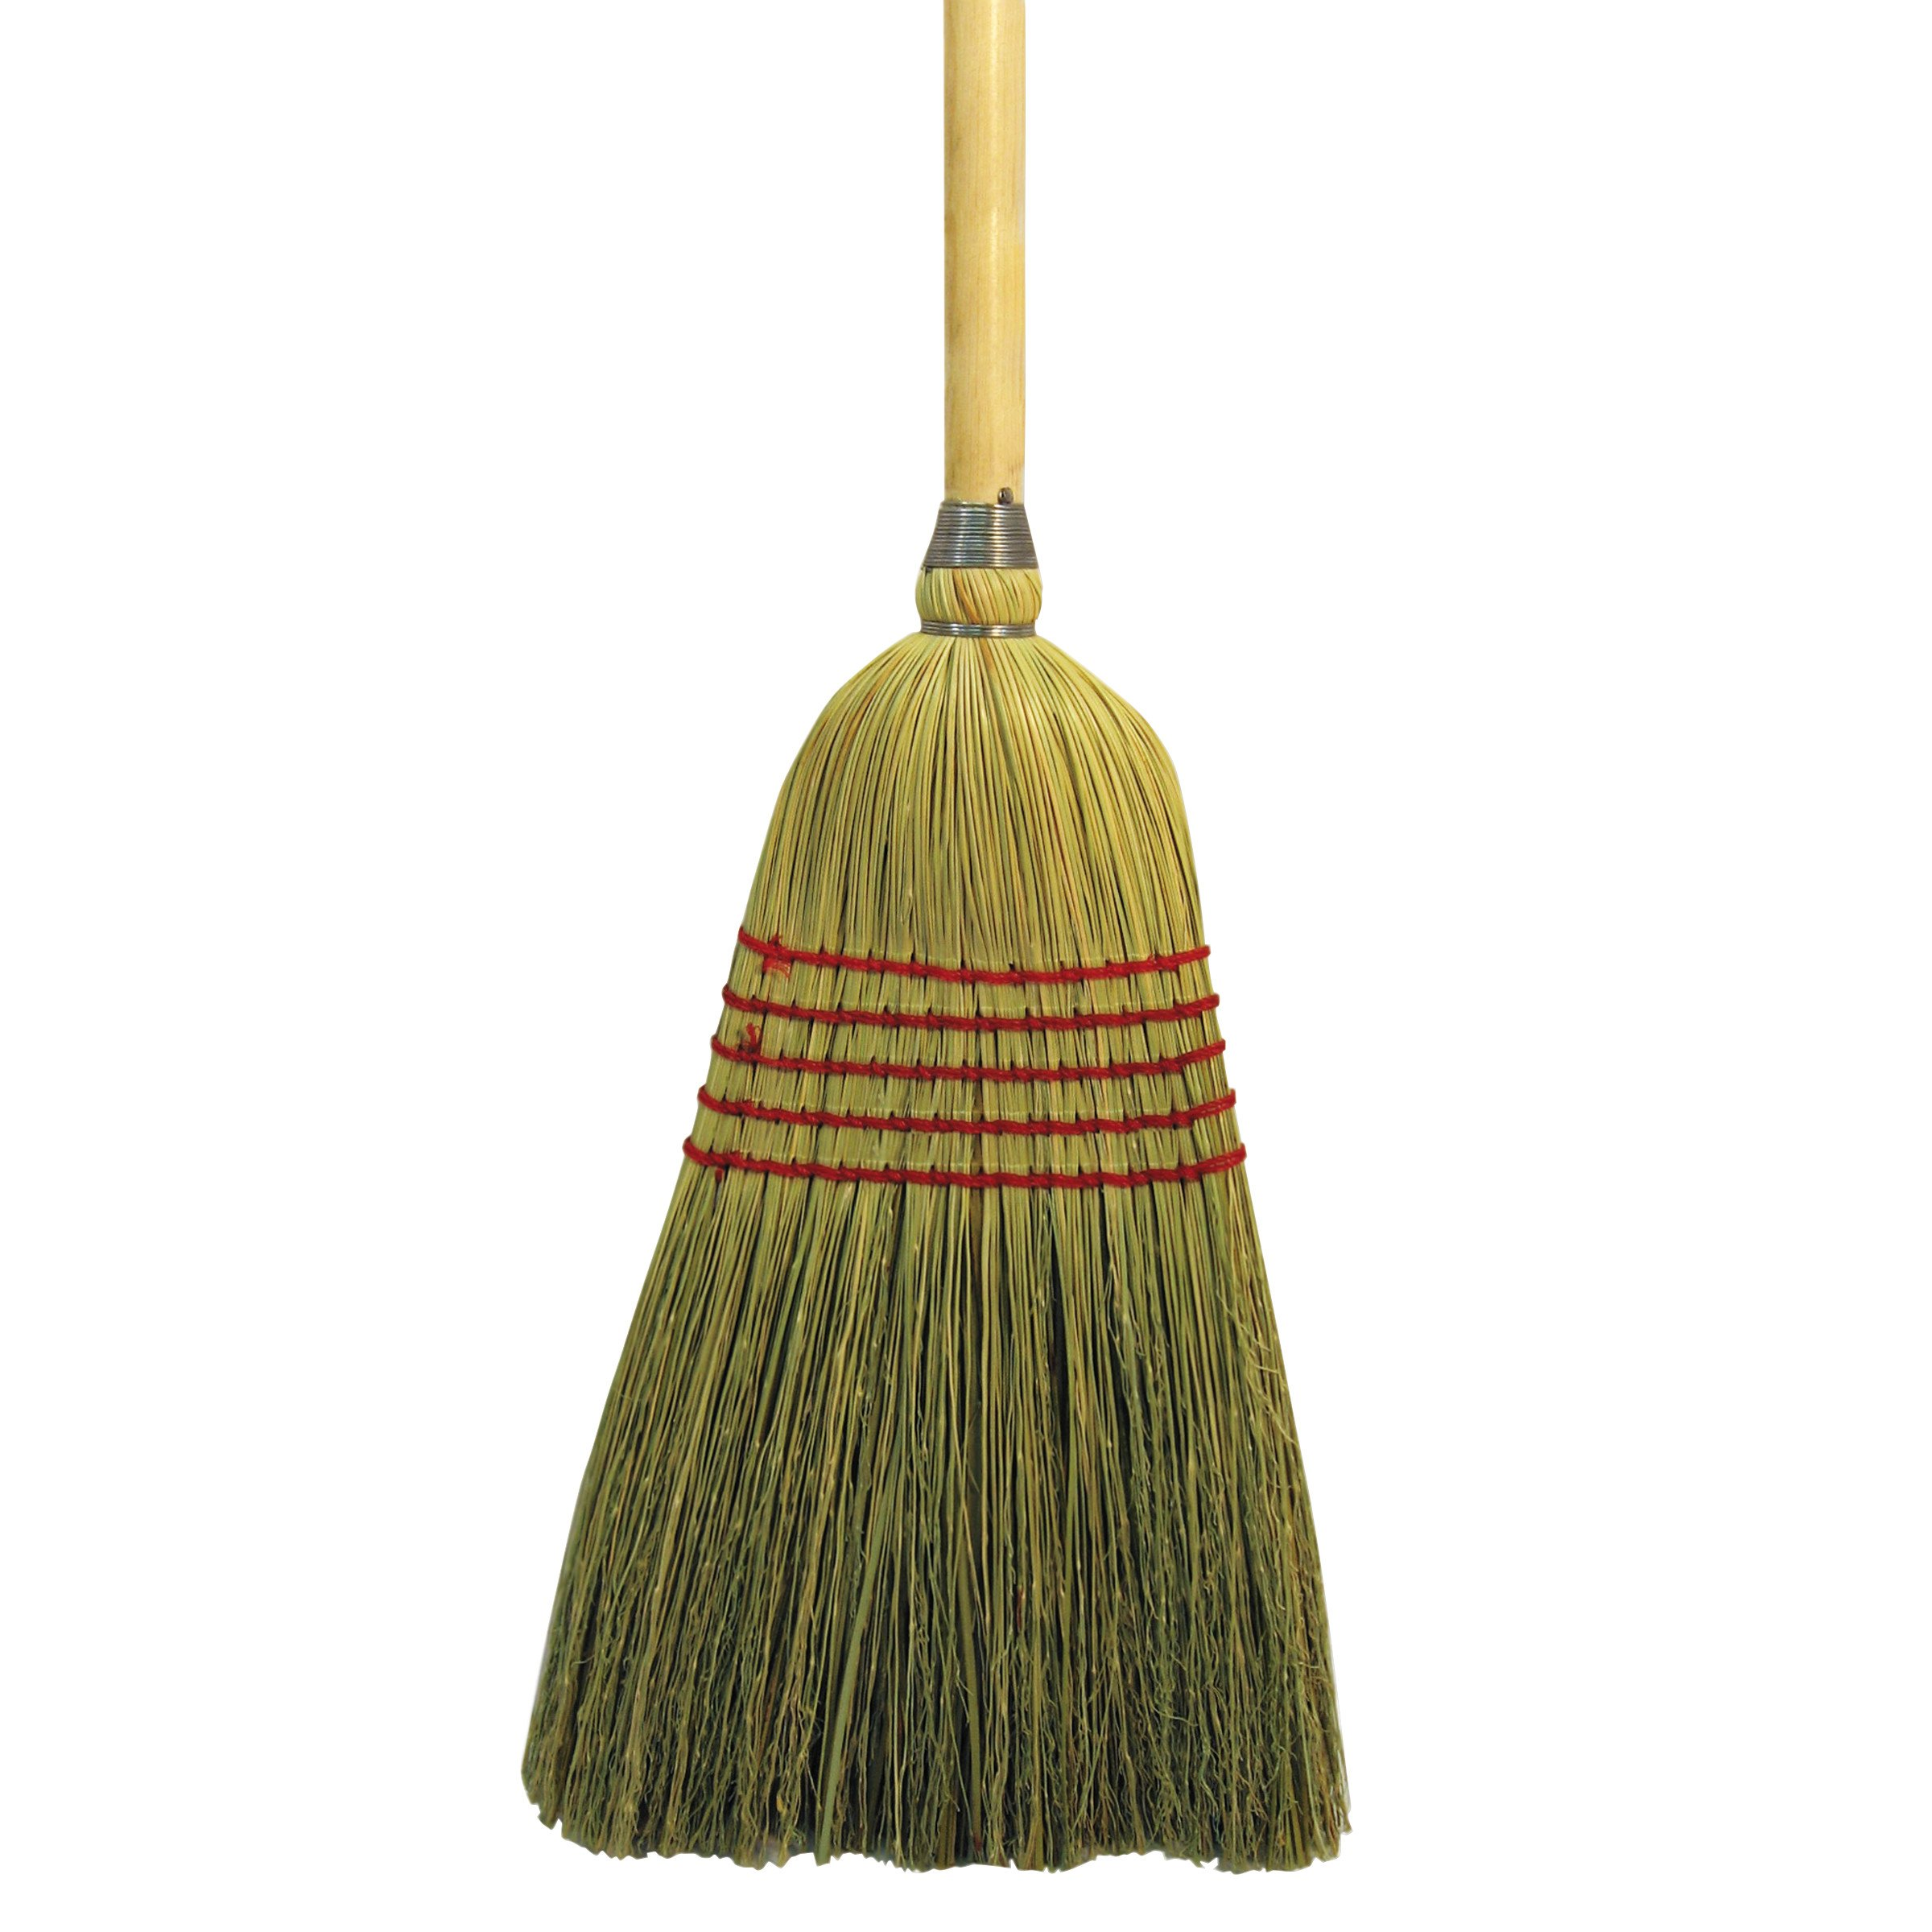 UNISAN Parlor Broom, Yucca/Corn Fiber Bristles, 42 Inch Wood Handle, Natural (926Y)